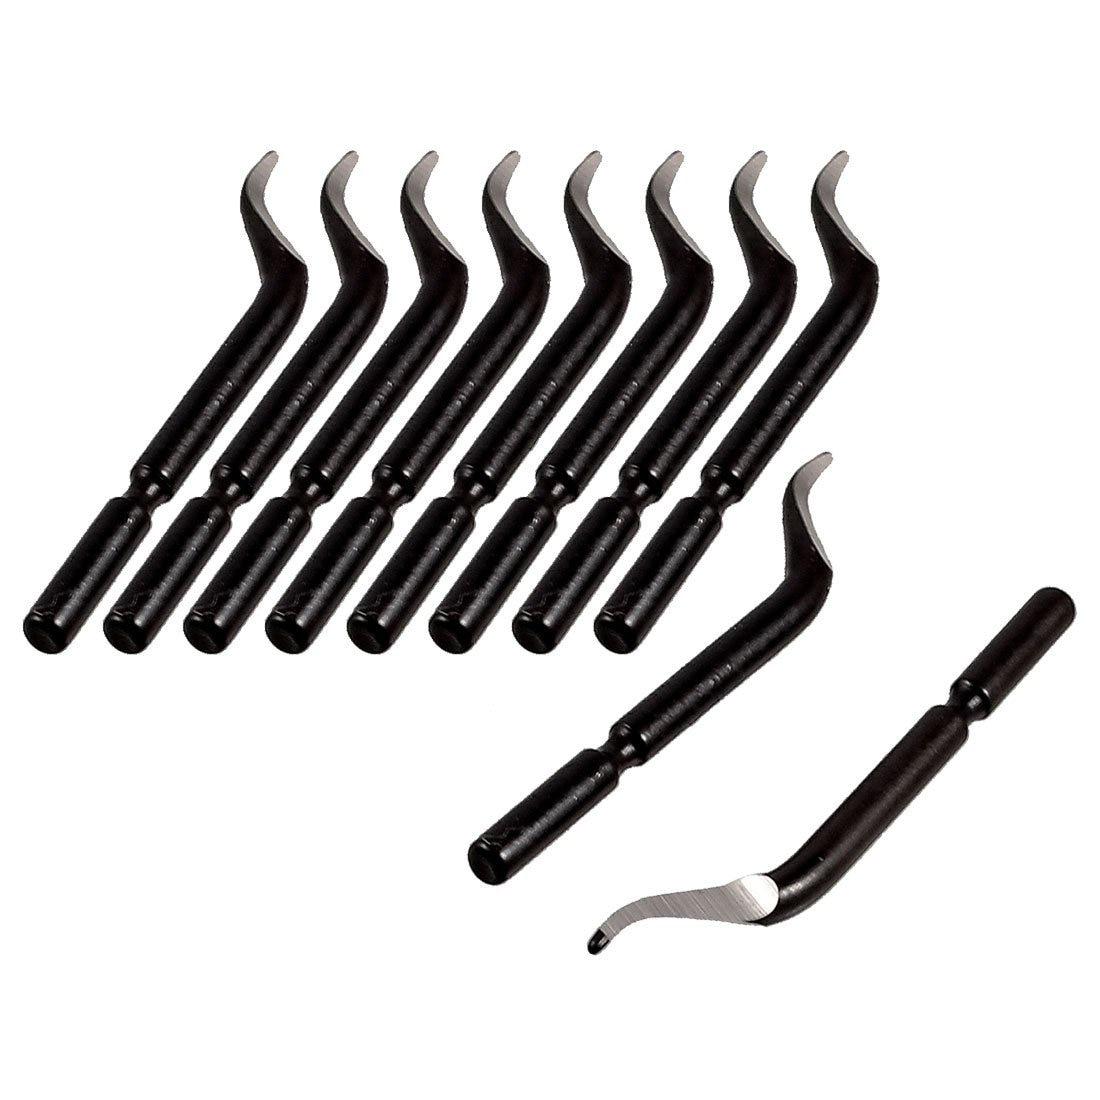 Replacement Deburred Tool BK3010 S150 Deburring Blades 10 Pcs